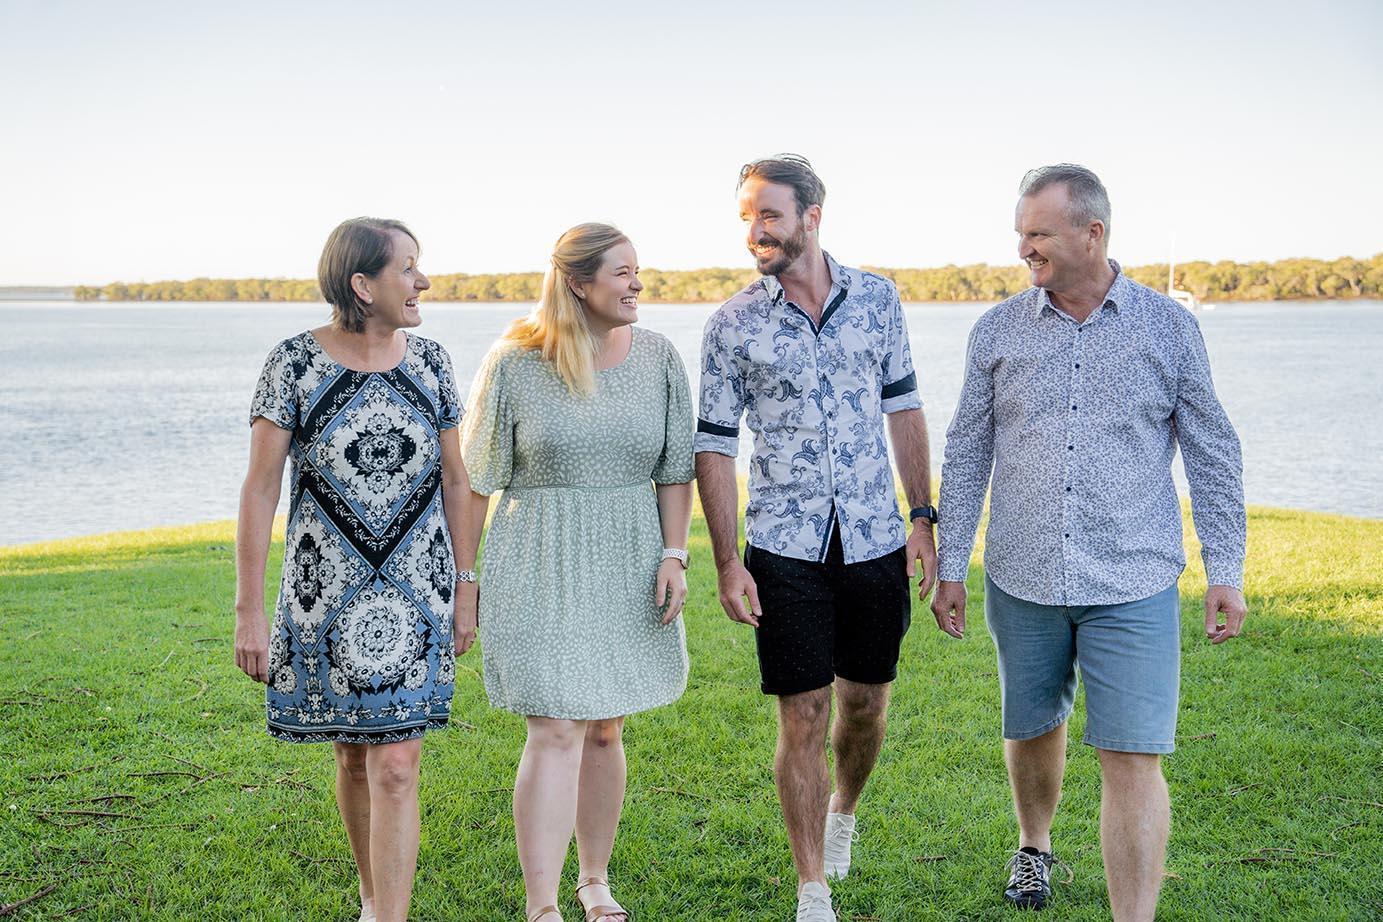 Family Photography near water